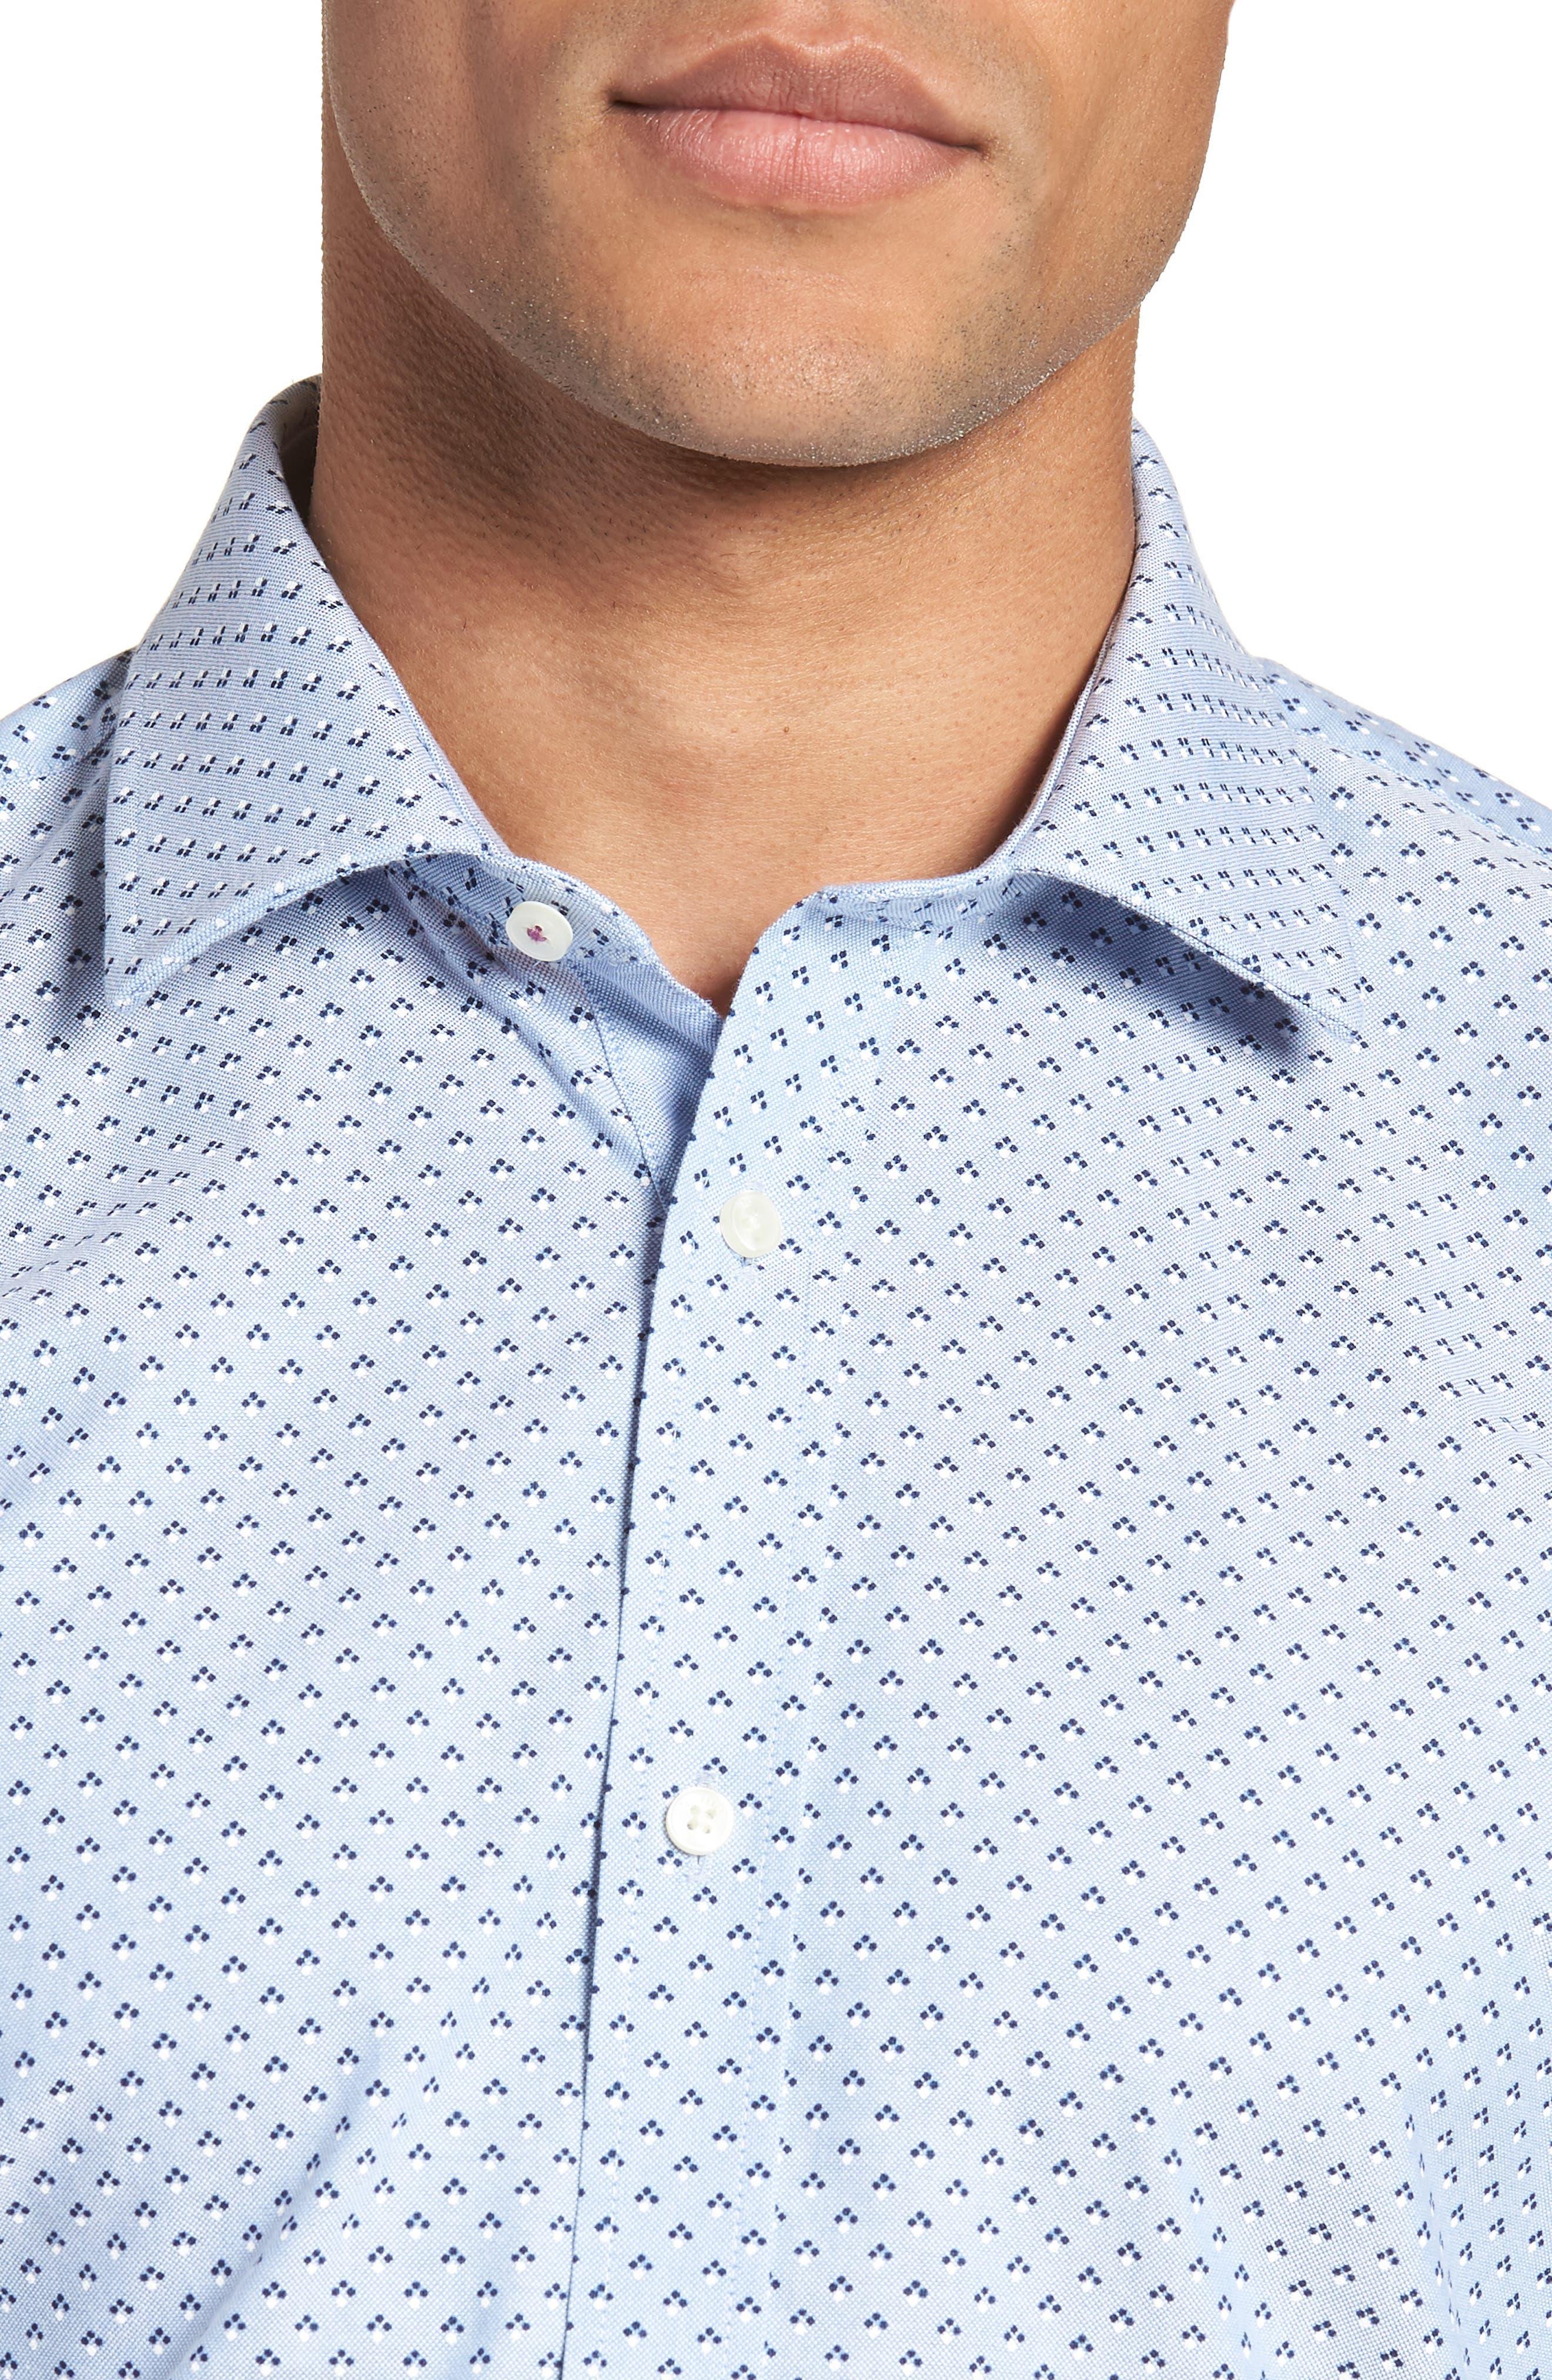 Forestr Trim Fit Geometric Dress Shirt,                             Alternate thumbnail 2, color,                             Blue